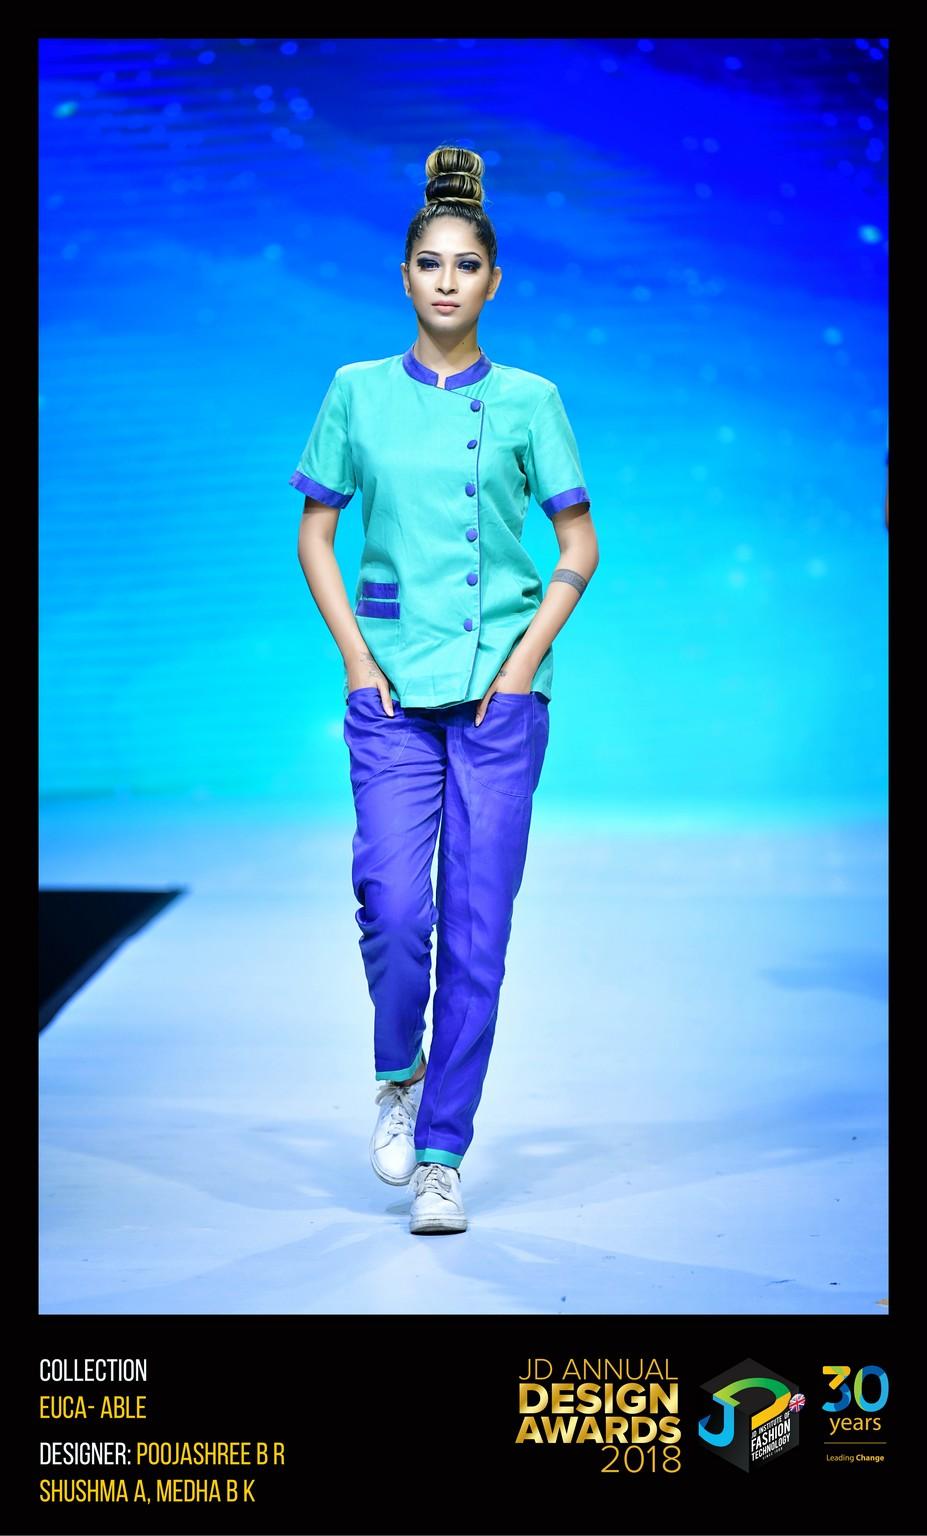 Euca-able – Change – JD Annual Design Awards 2018 | Designer: Poojashree, Sushma and Medha | Photography : Jerin Nath (@jerin_nath) euca-able - EUCA ABLE 4 - Euca-able – Change – JD Annual Design Awards 2018